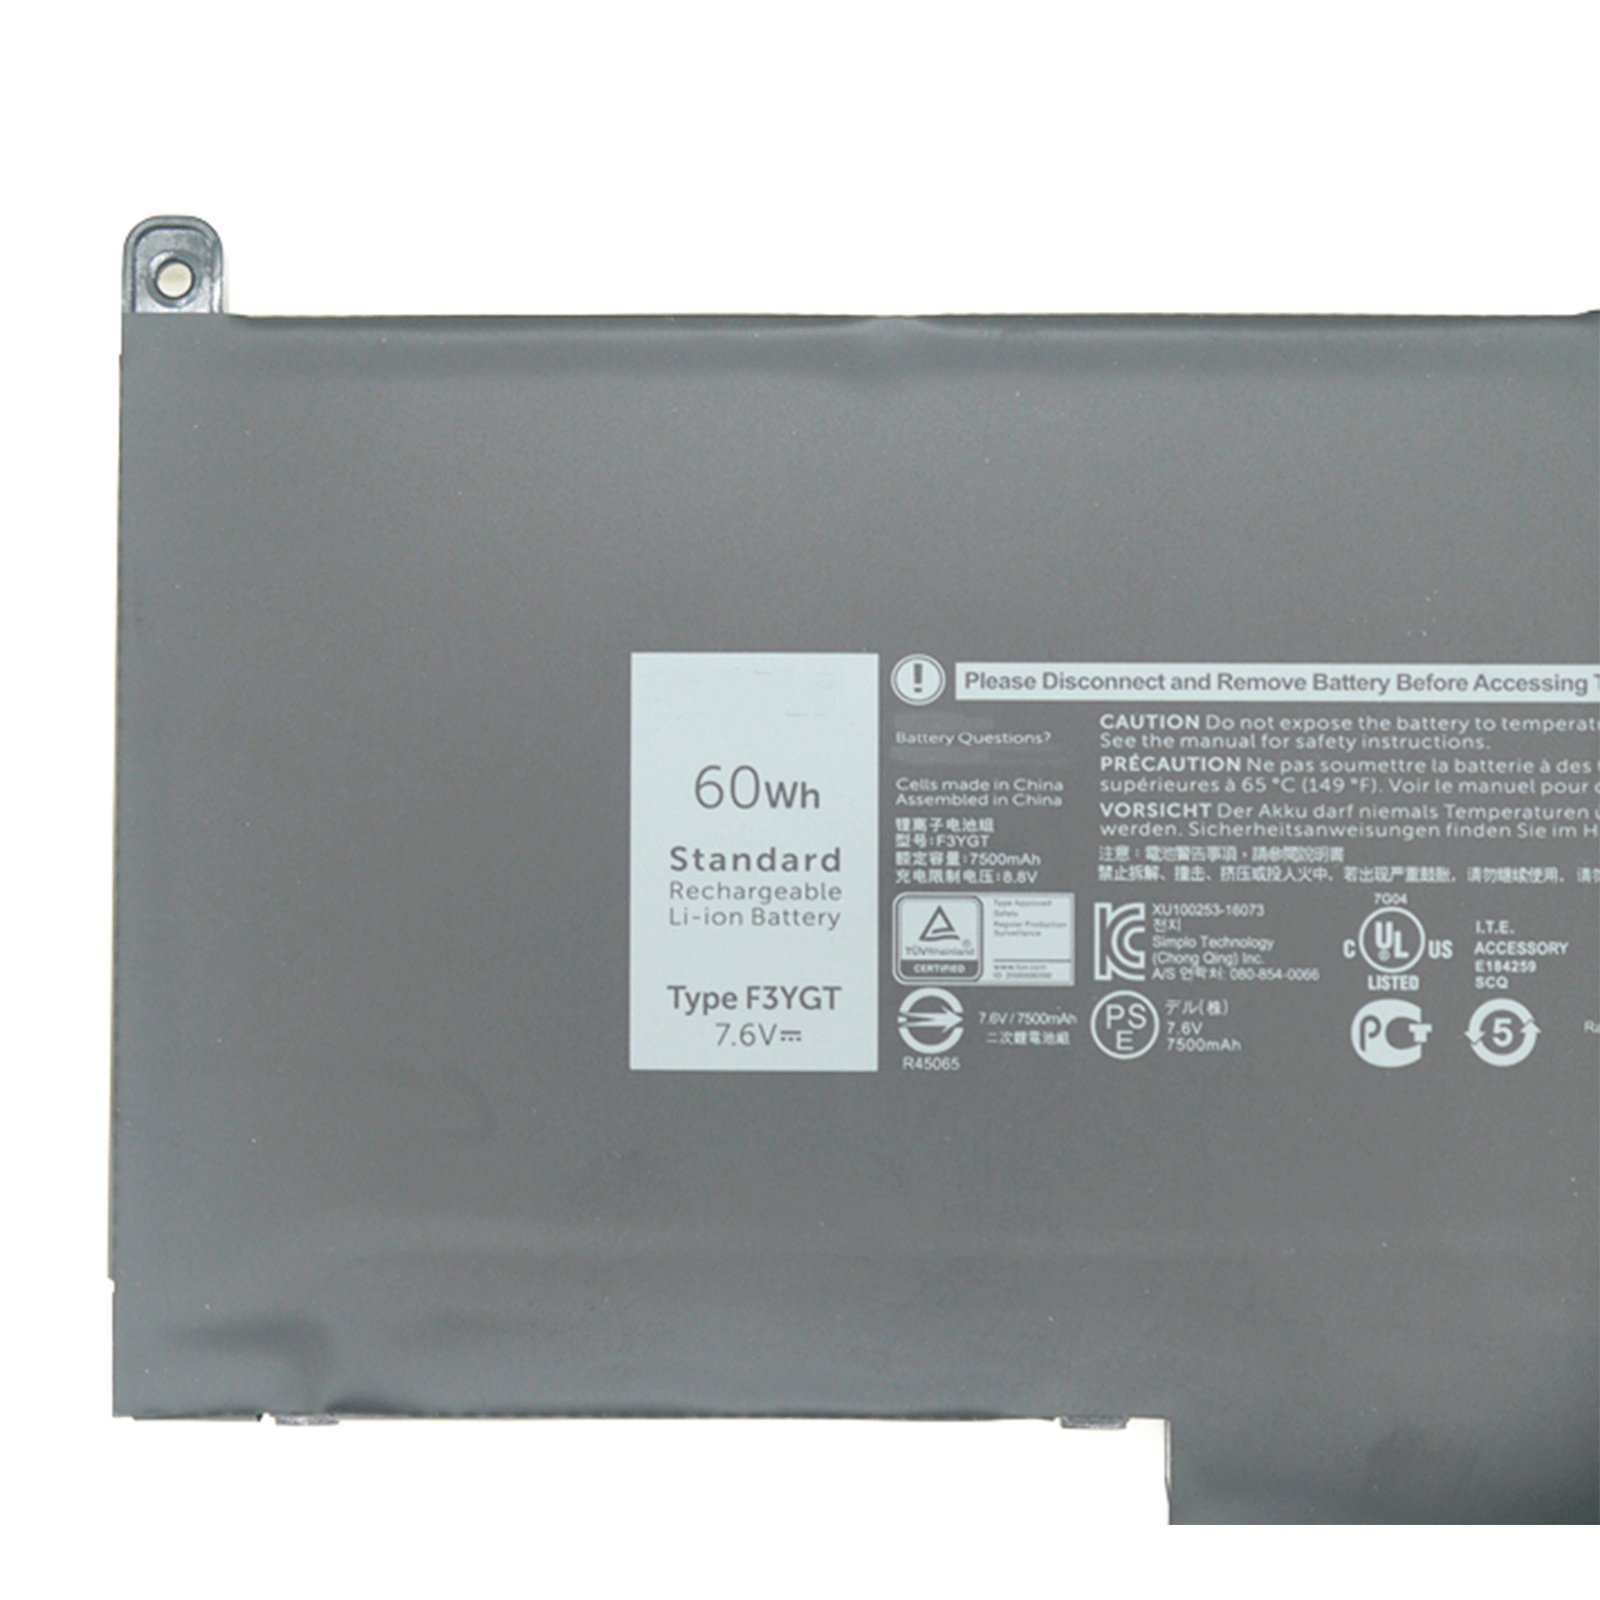 Dentsing F3YGT battery for Dell Latitude 7280 Latitude 7480 DM3WC 0DM3WC 2X39G 7.6V 60Whr by Dentsing (Image #2)